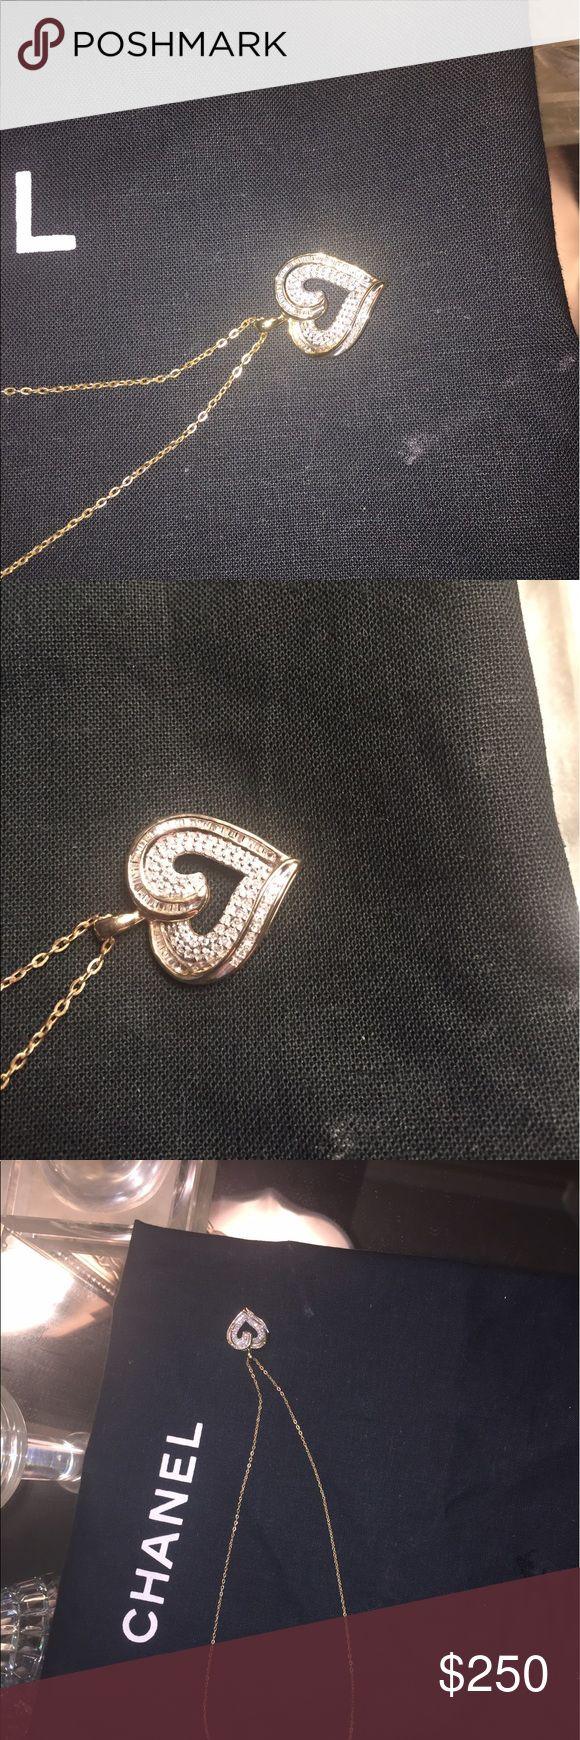 Diamond heart necklace... real diamonds 💎! Diamonds 💎 are a girls bff!!! Jewelry Necklaces